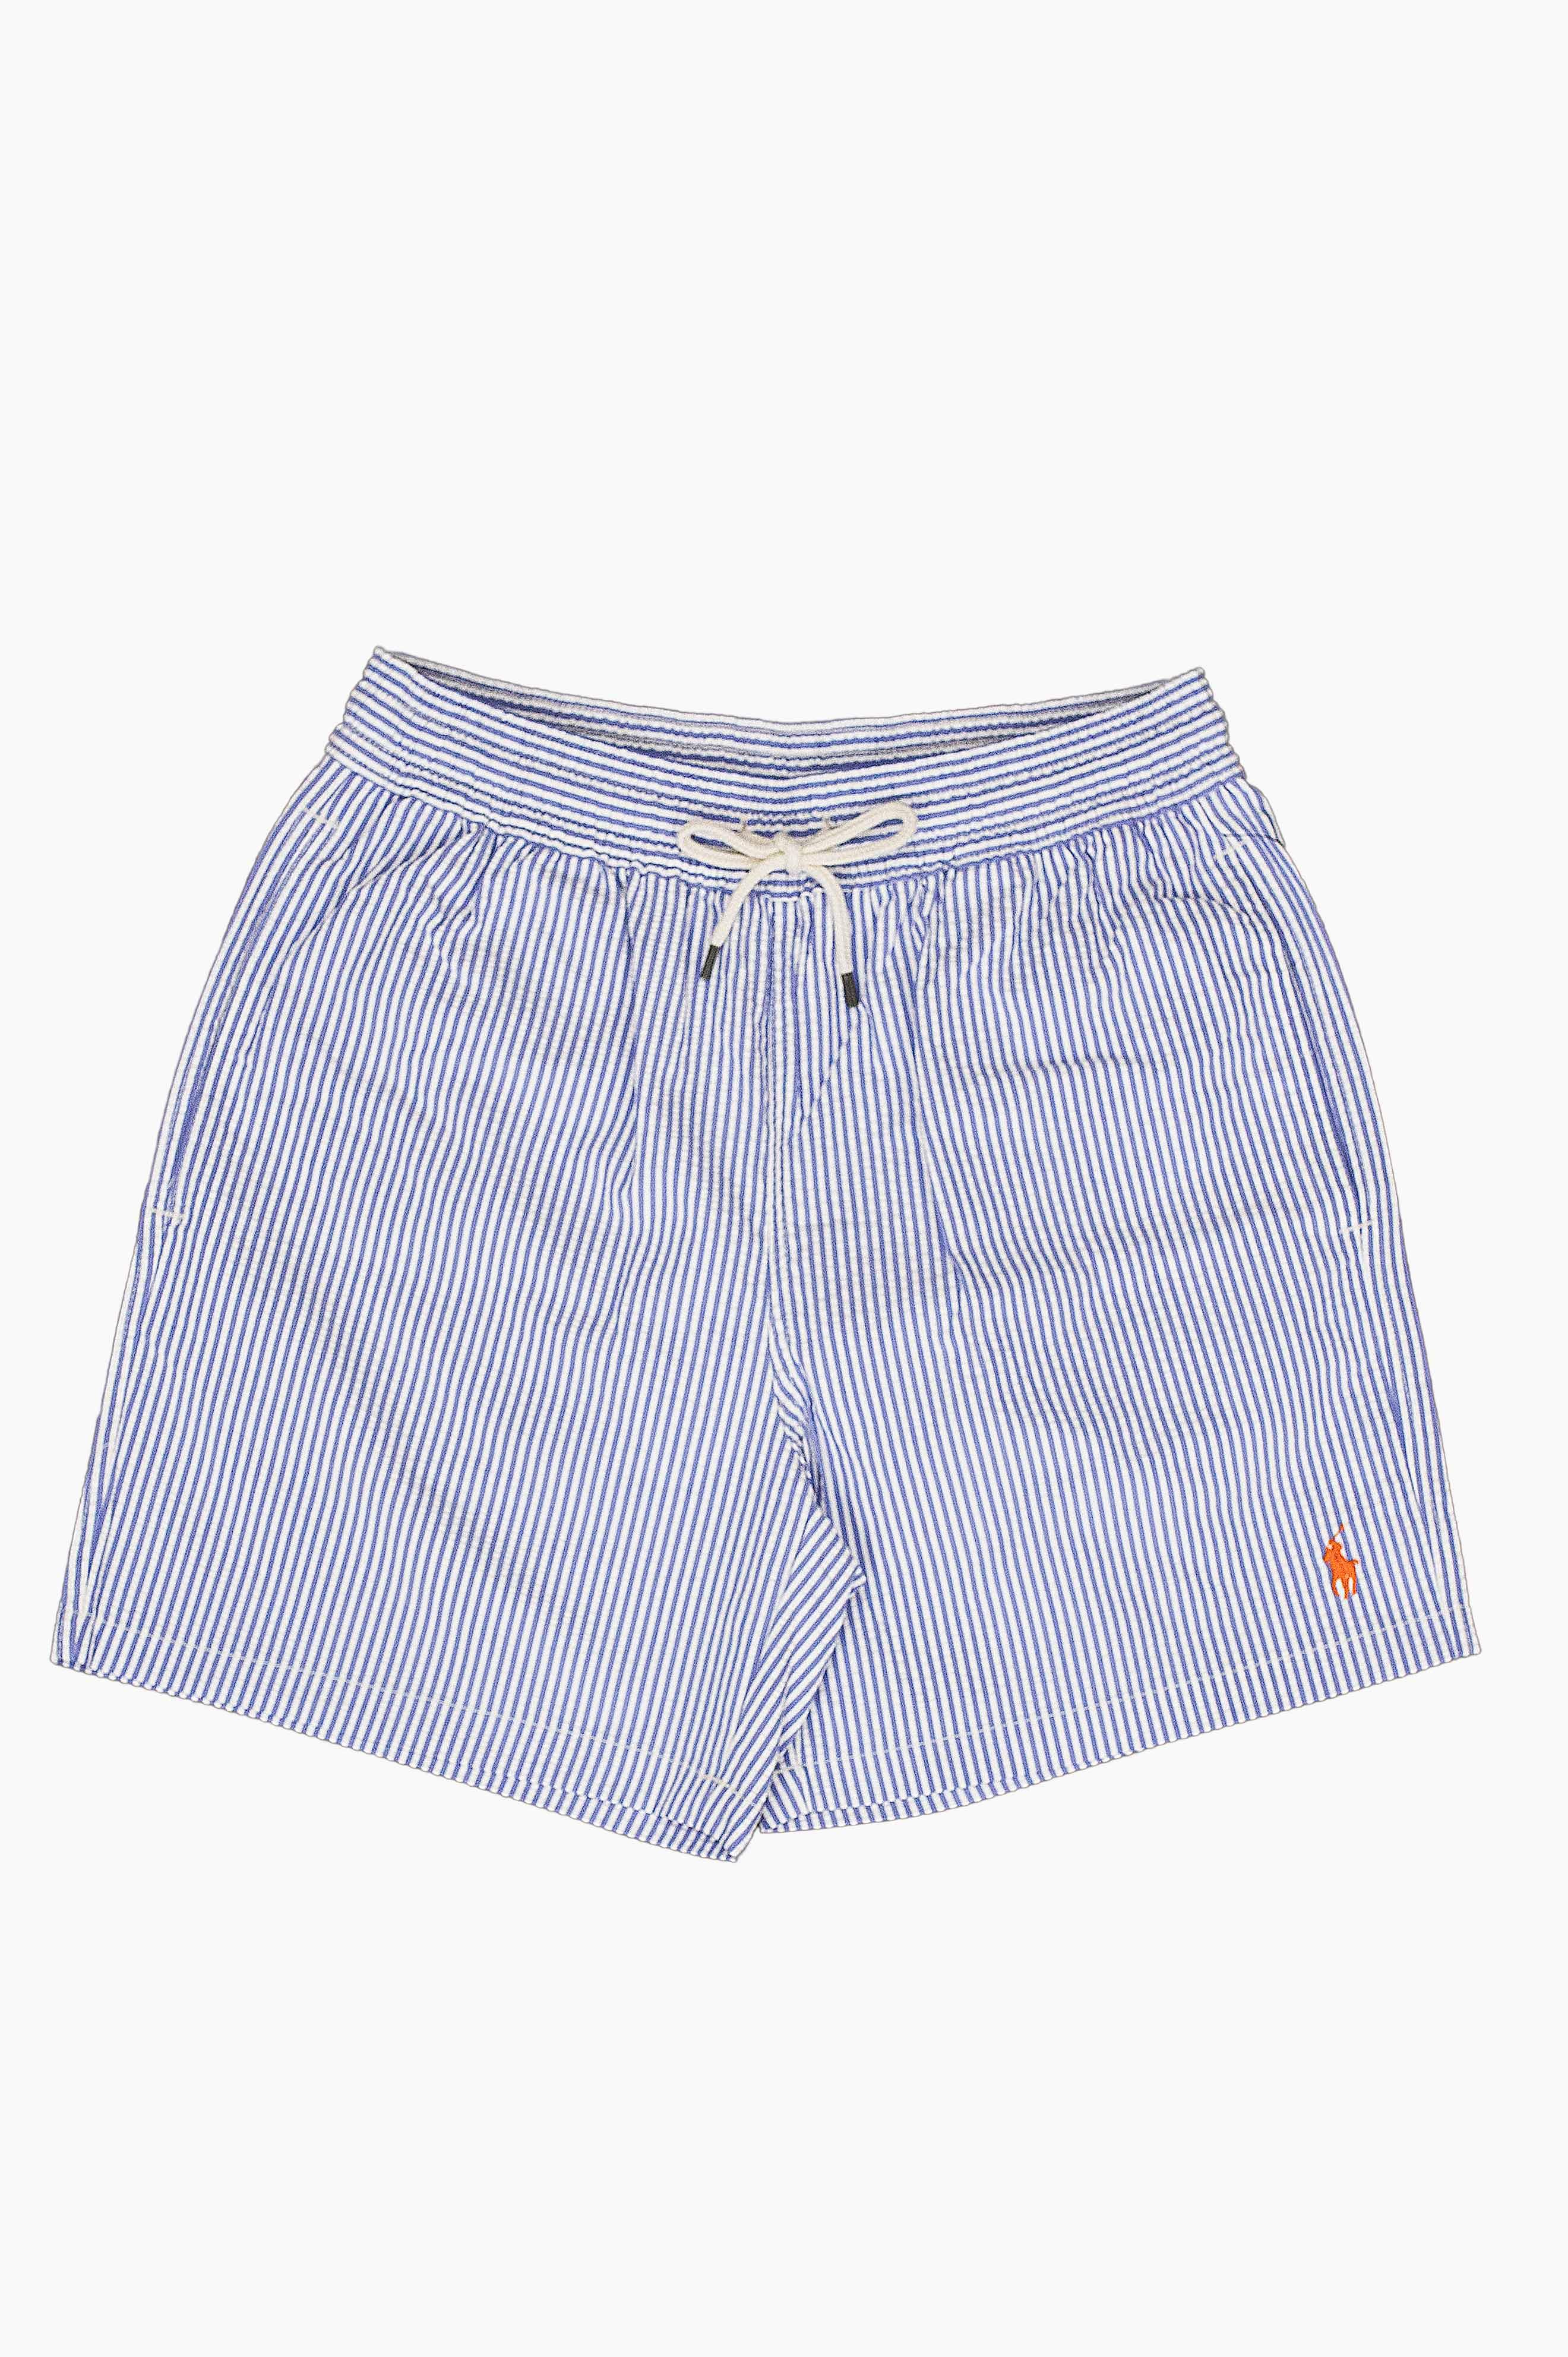 Traveler Seersucker Swim Shorts Blue